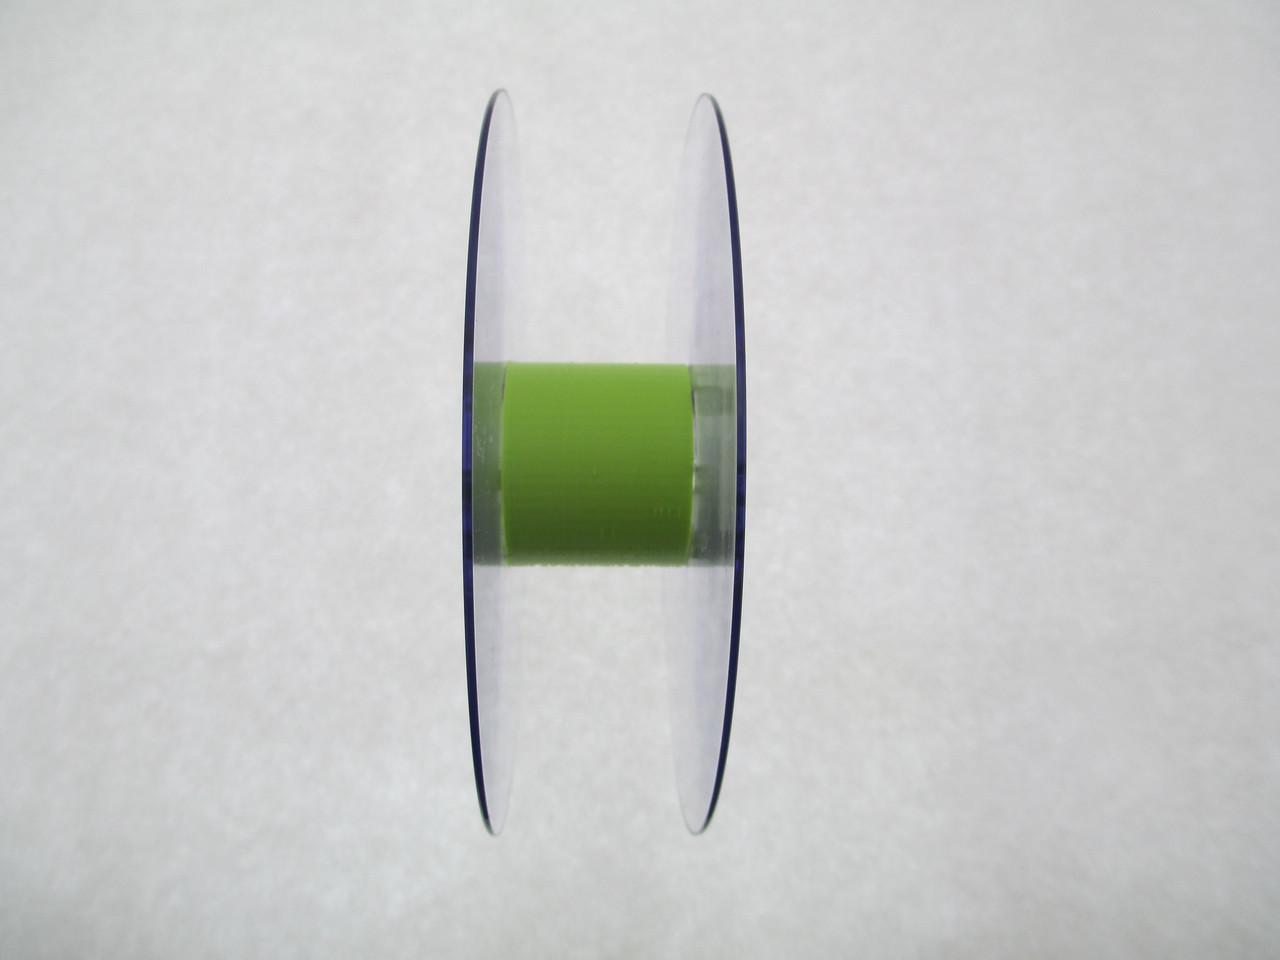 Катушка для мерных материалов : тесьма, ленты, нити, шнуры. Диаметр 121мм, диаметр катушки 35 мм, ширина 30 мм - Spark beadS в Киевской области